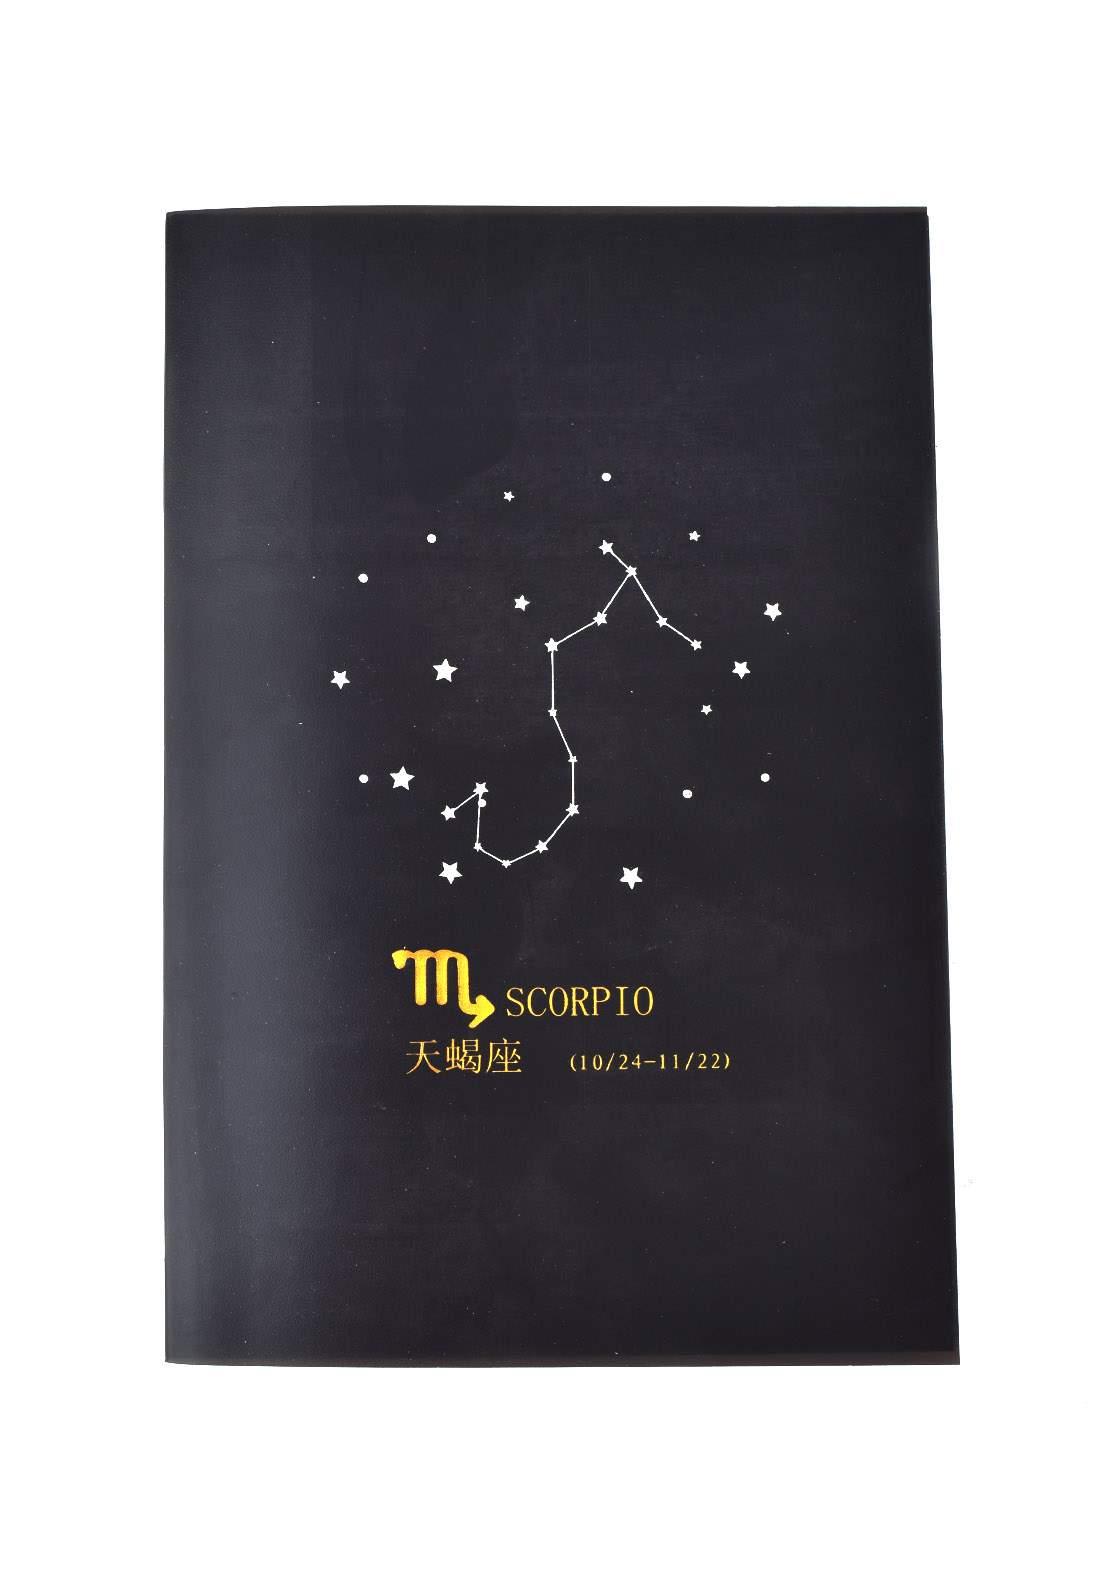 Big Black Drawing Book 24 Sheets-Scorpio دفتر رسم اسود كبير بطبعة برج العقرب